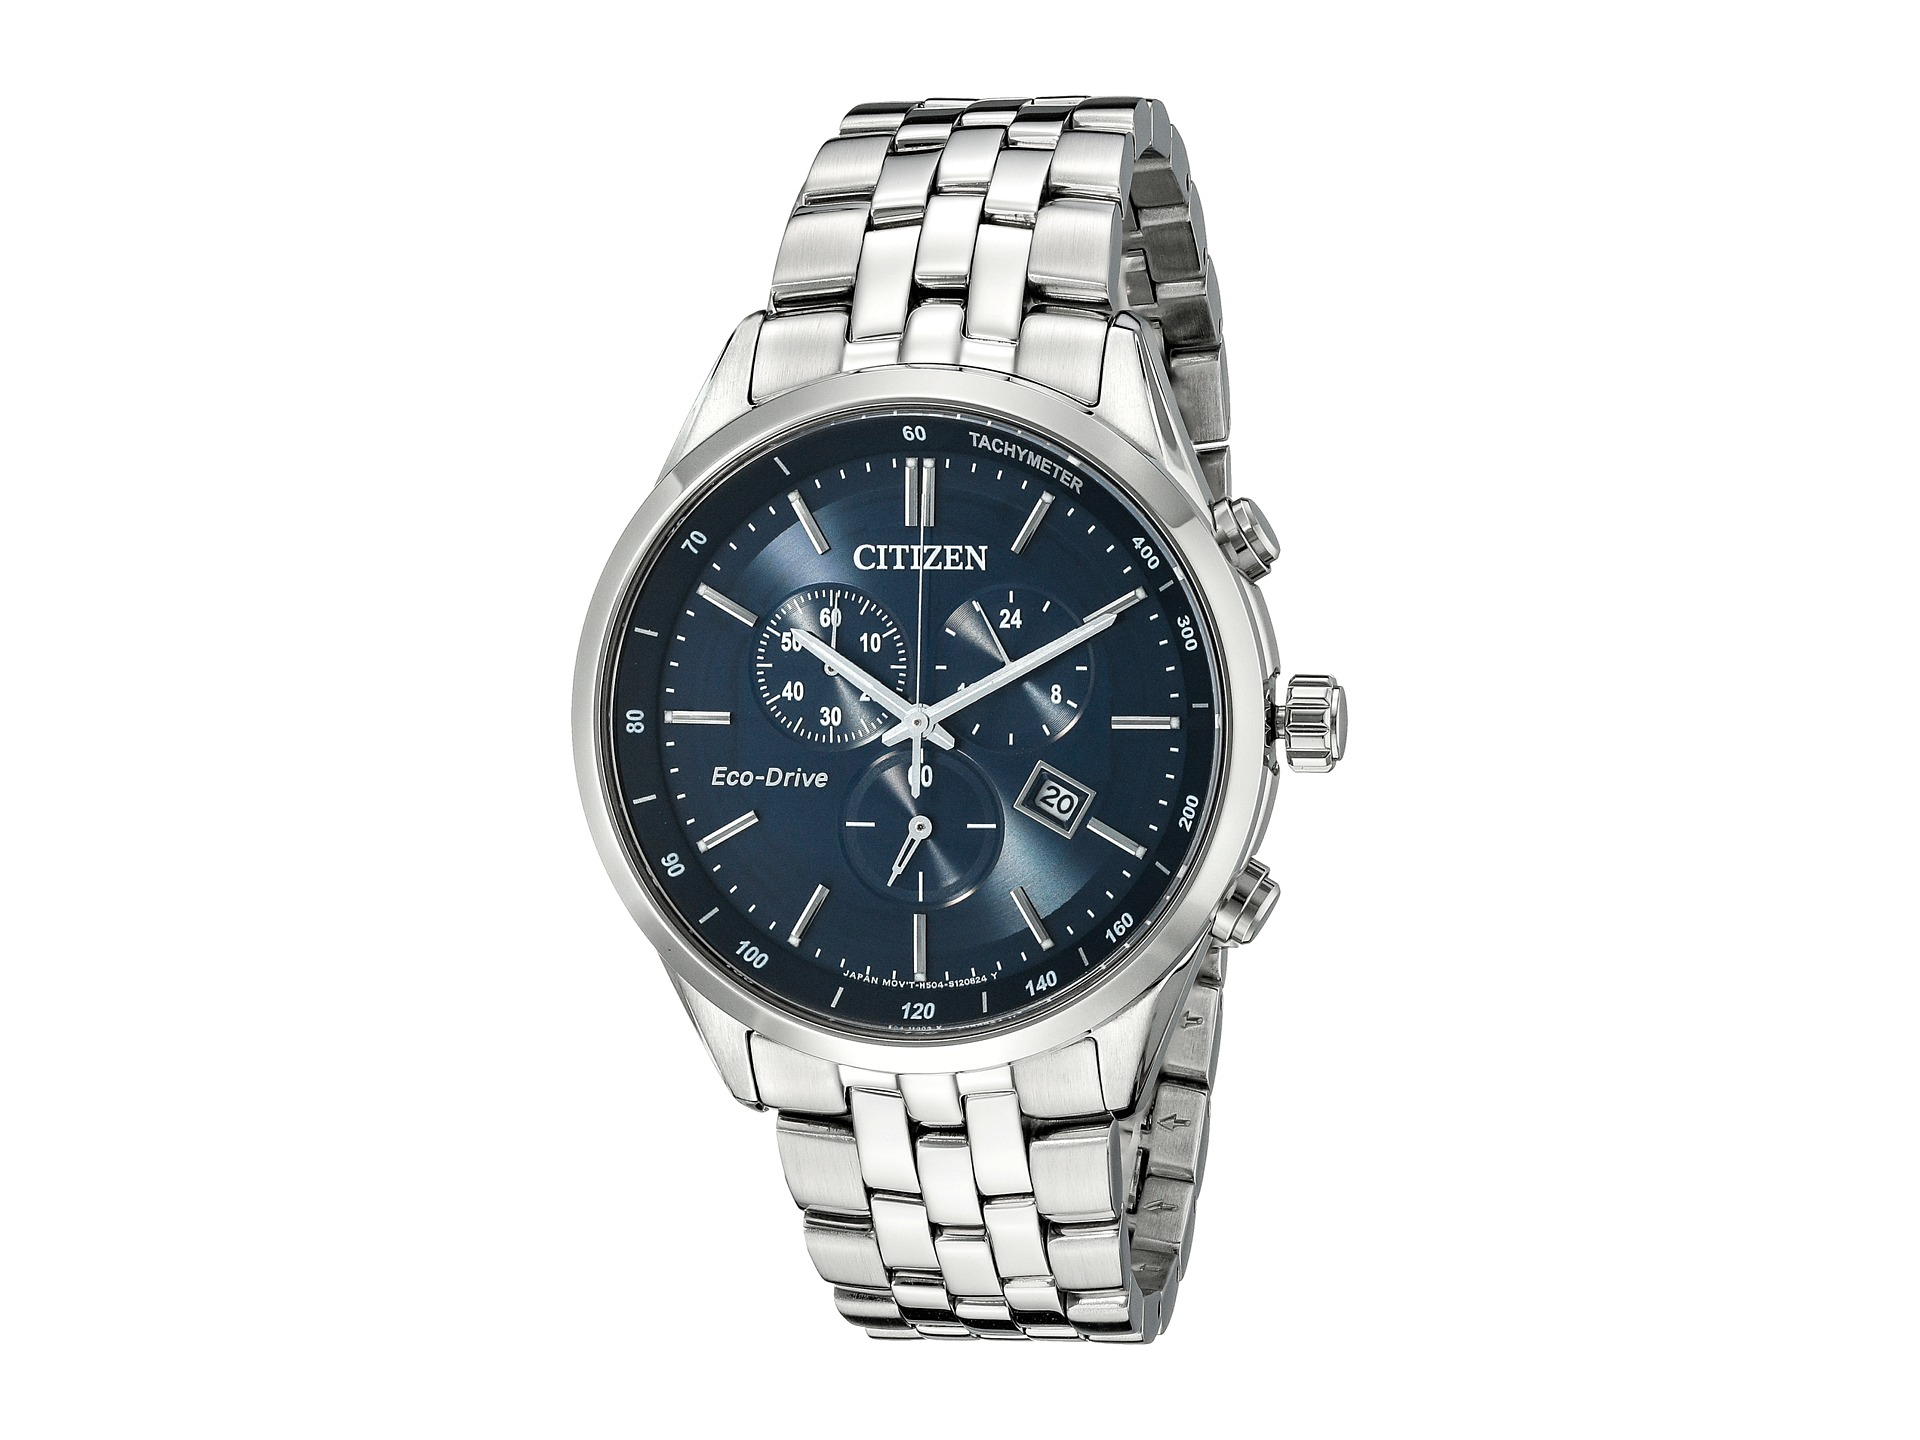 0f94d371f2ed Details about Citizen Men s Eco-Drive Chronograph Sapphire Collection Watch  AT2141-52L